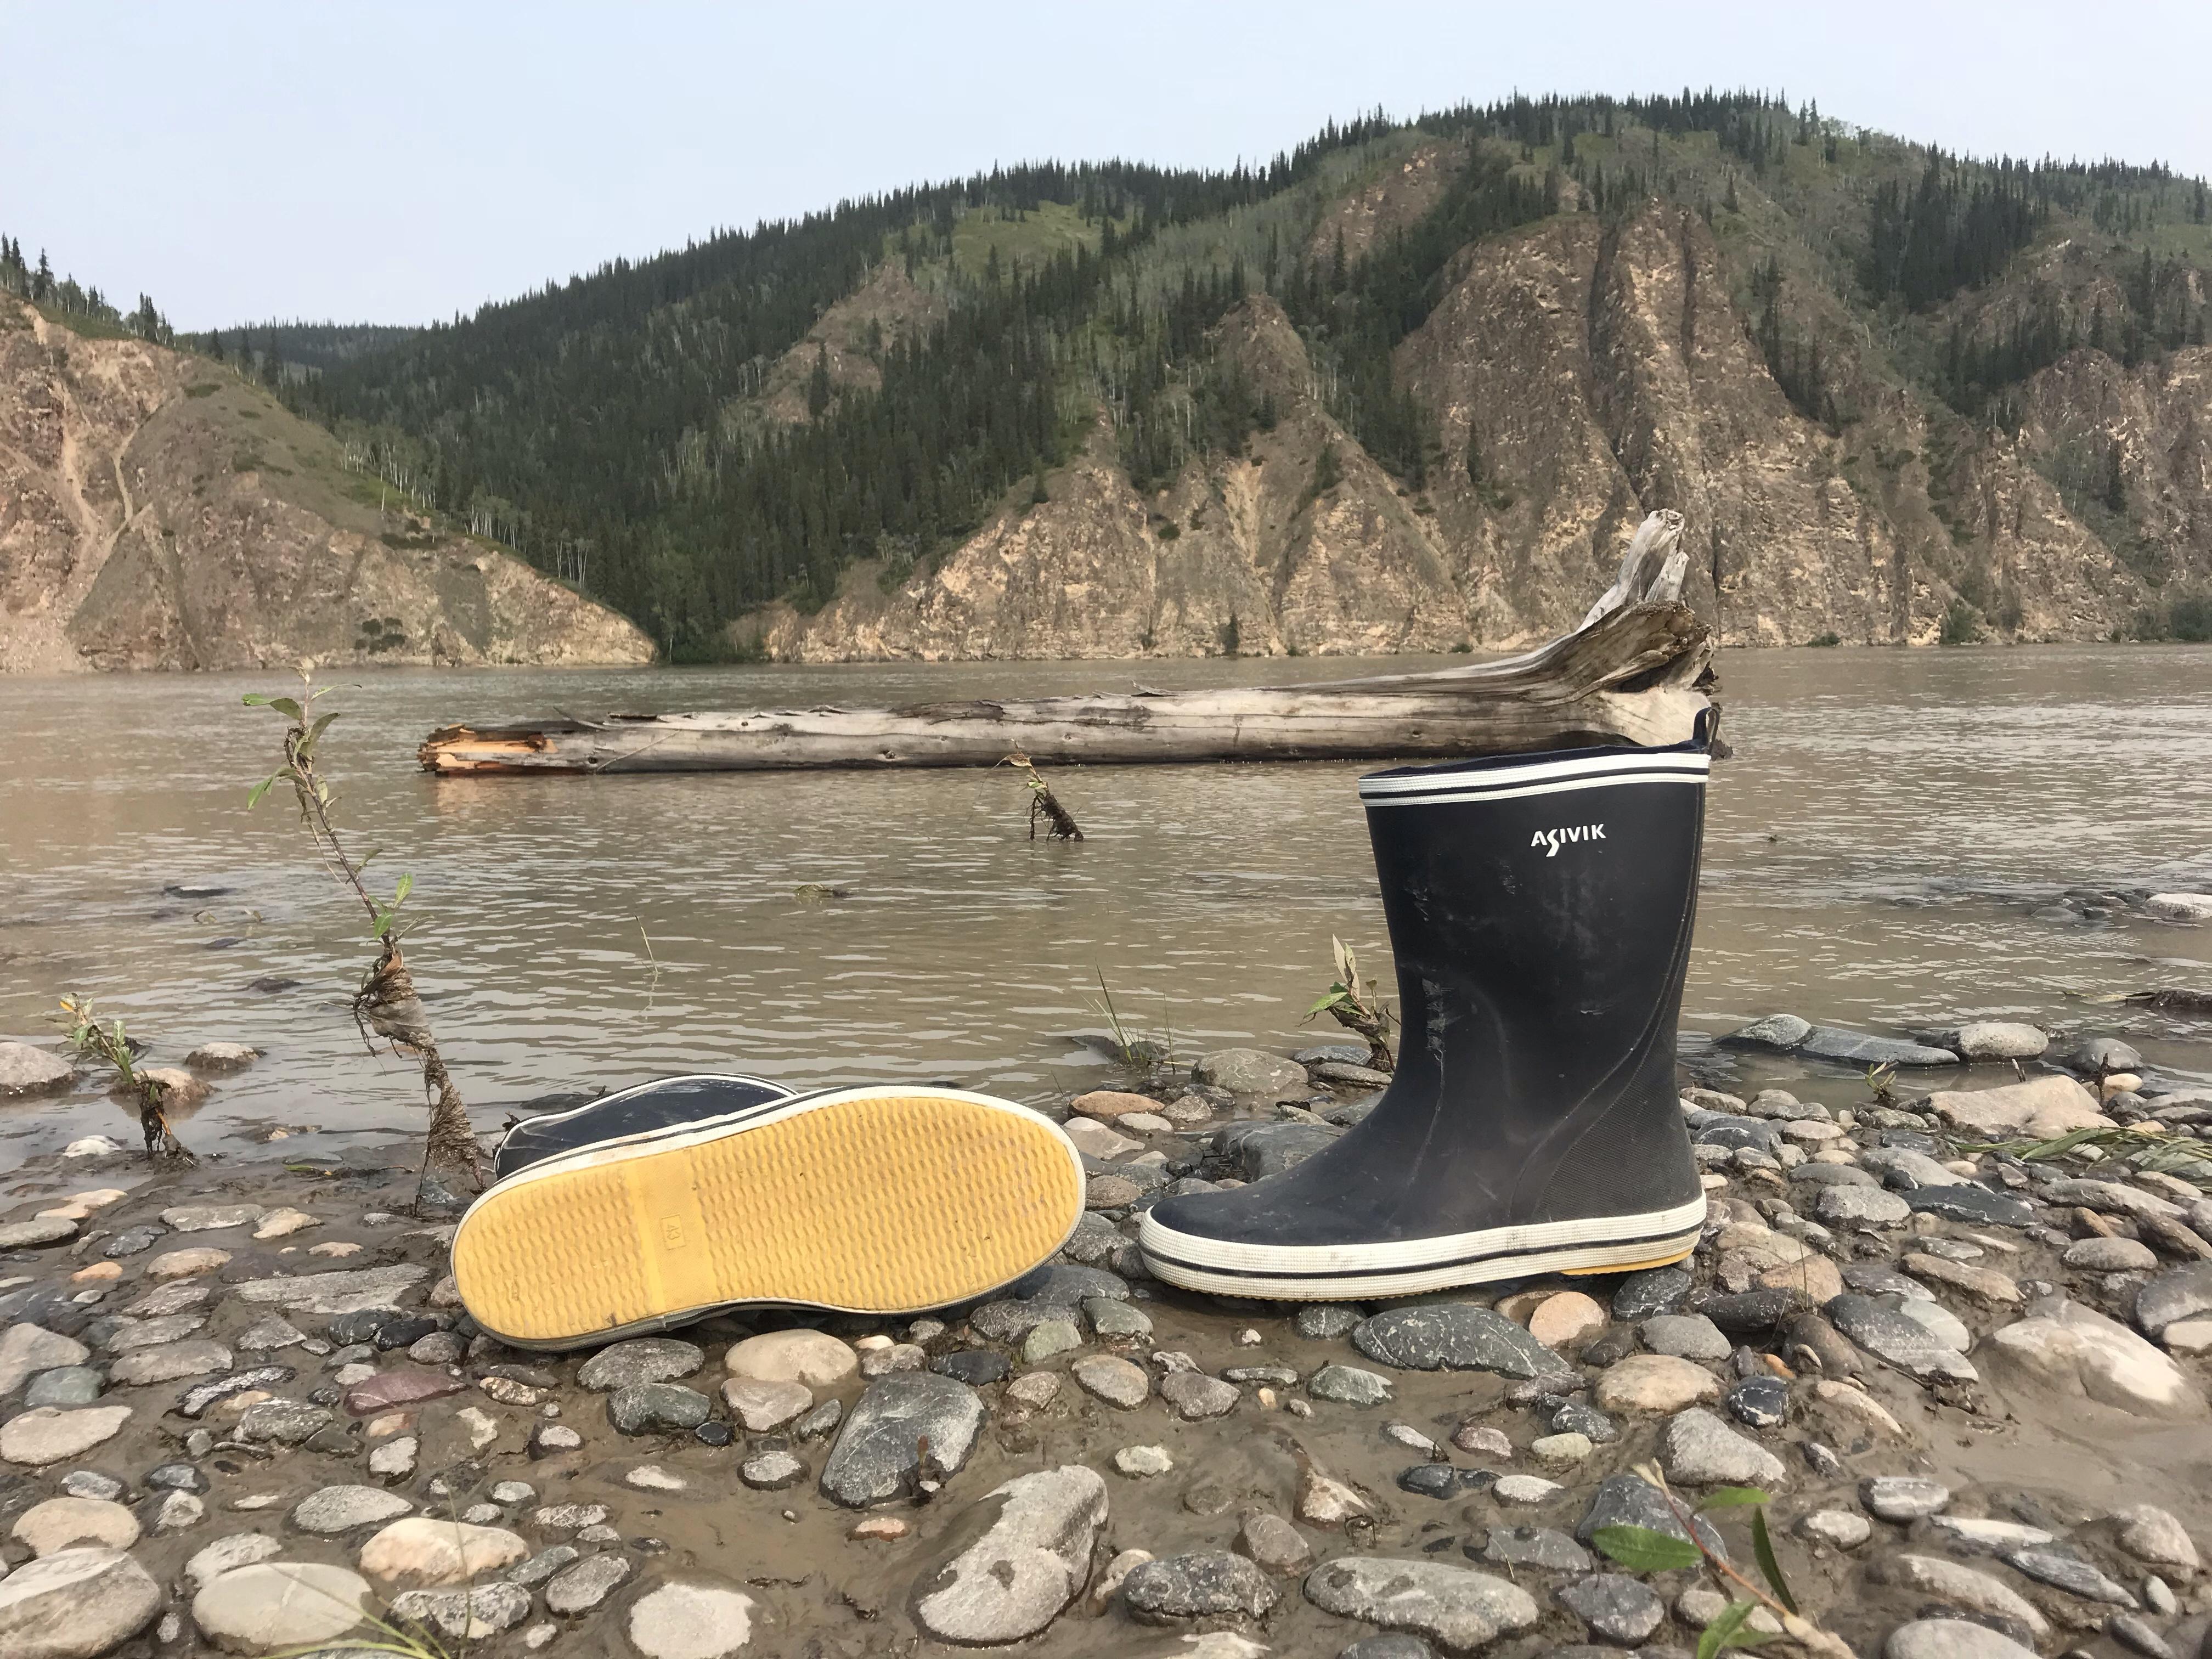 Efterstræbte Asivik gummistøvler - anmeldelse - UtmedKnut ST-85